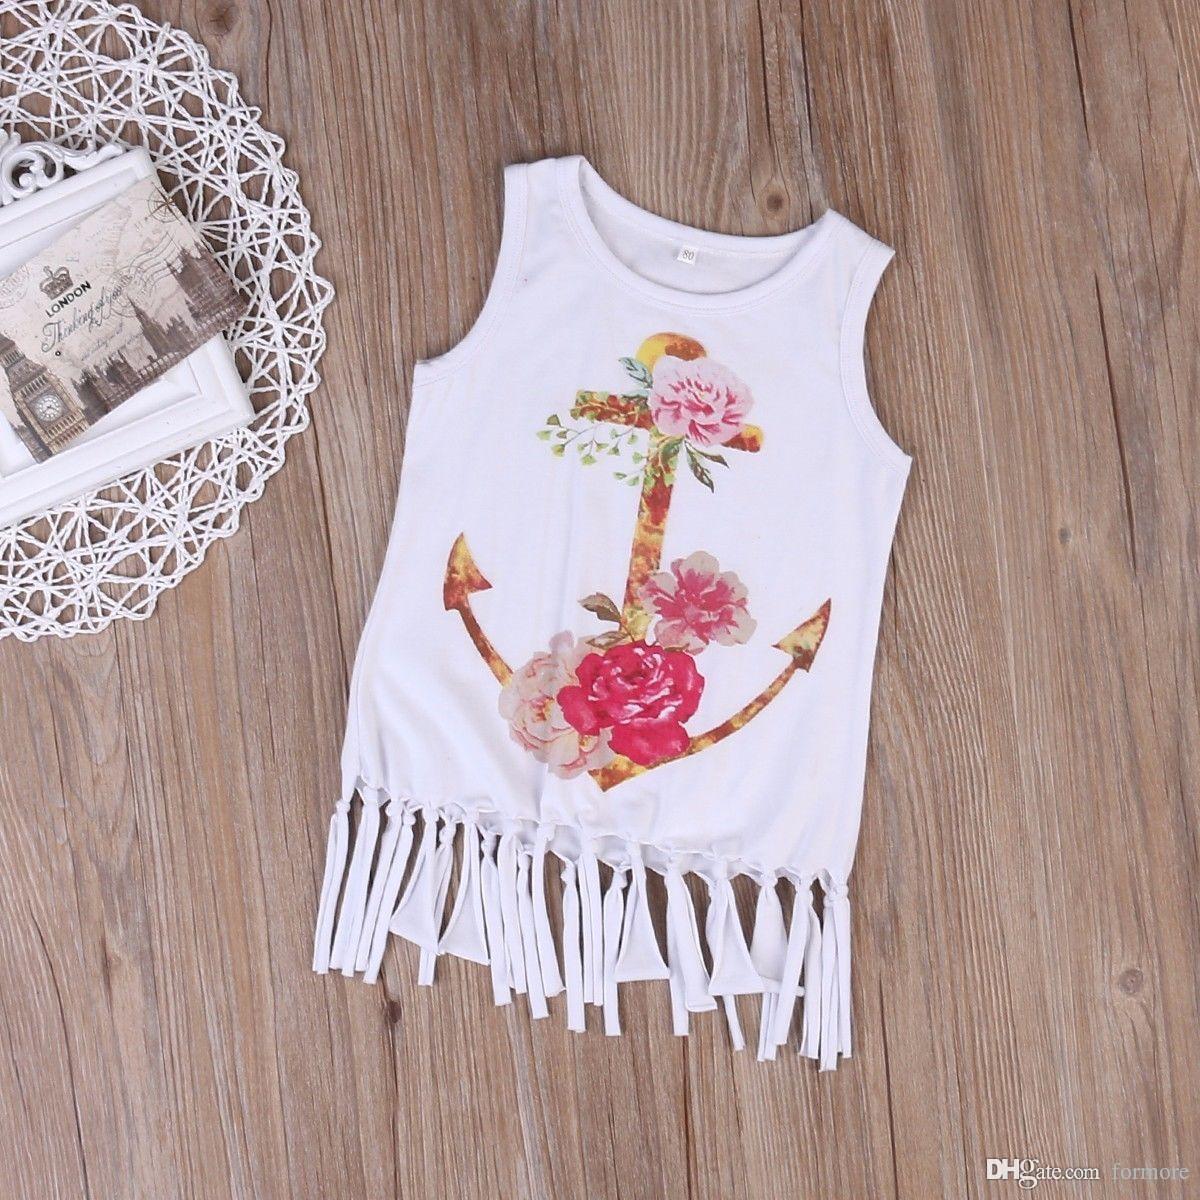 2017 Summer Girl T Shirt Baby Girl Clothes Children Clothing Fashion